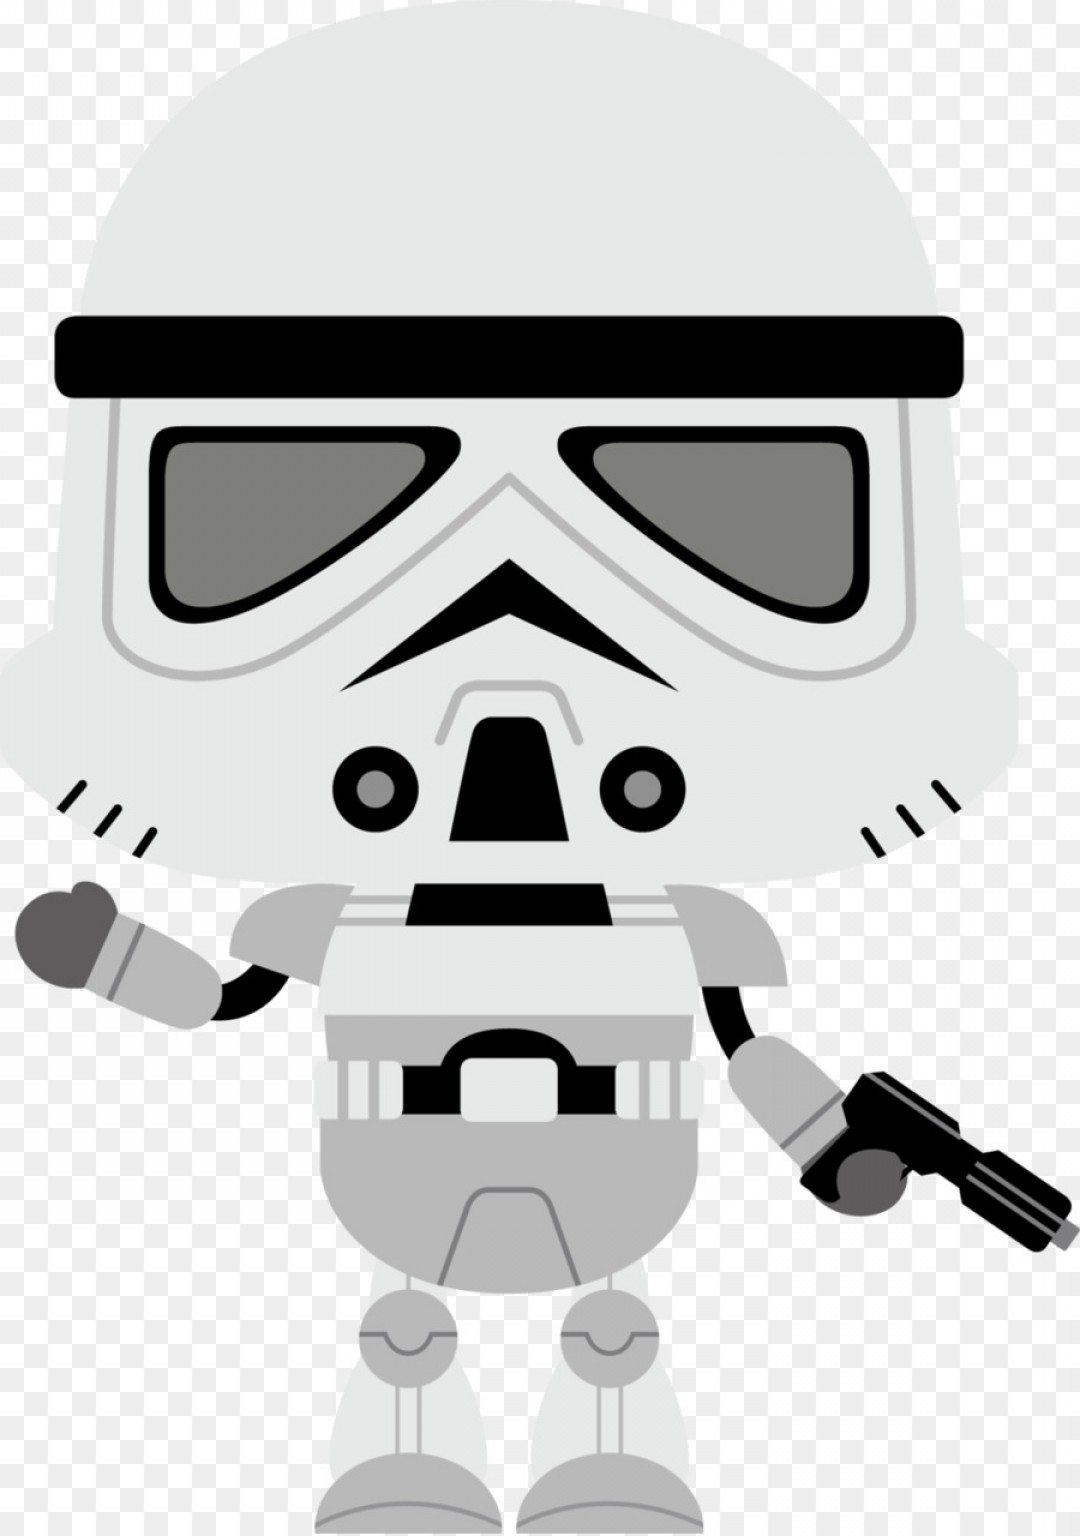 1080x1536 Png Clone Trooper Anakin Skywalker Stormtrooper Finn C Createmepink